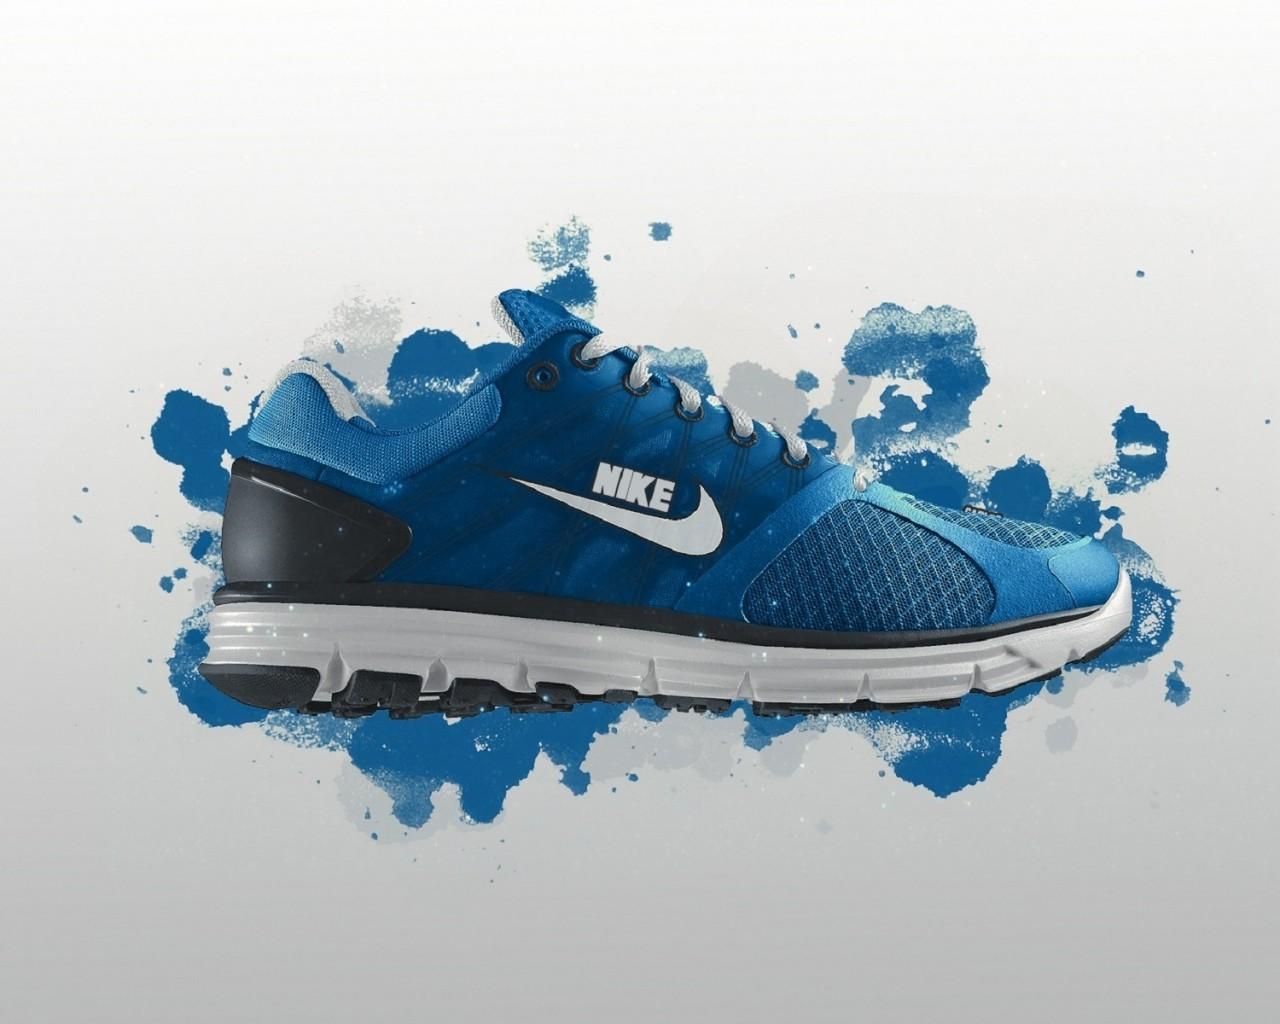 Blue Nike Shoes Air Wallpaper Image 14274 Wallpaper Wallpaper 1280x1024